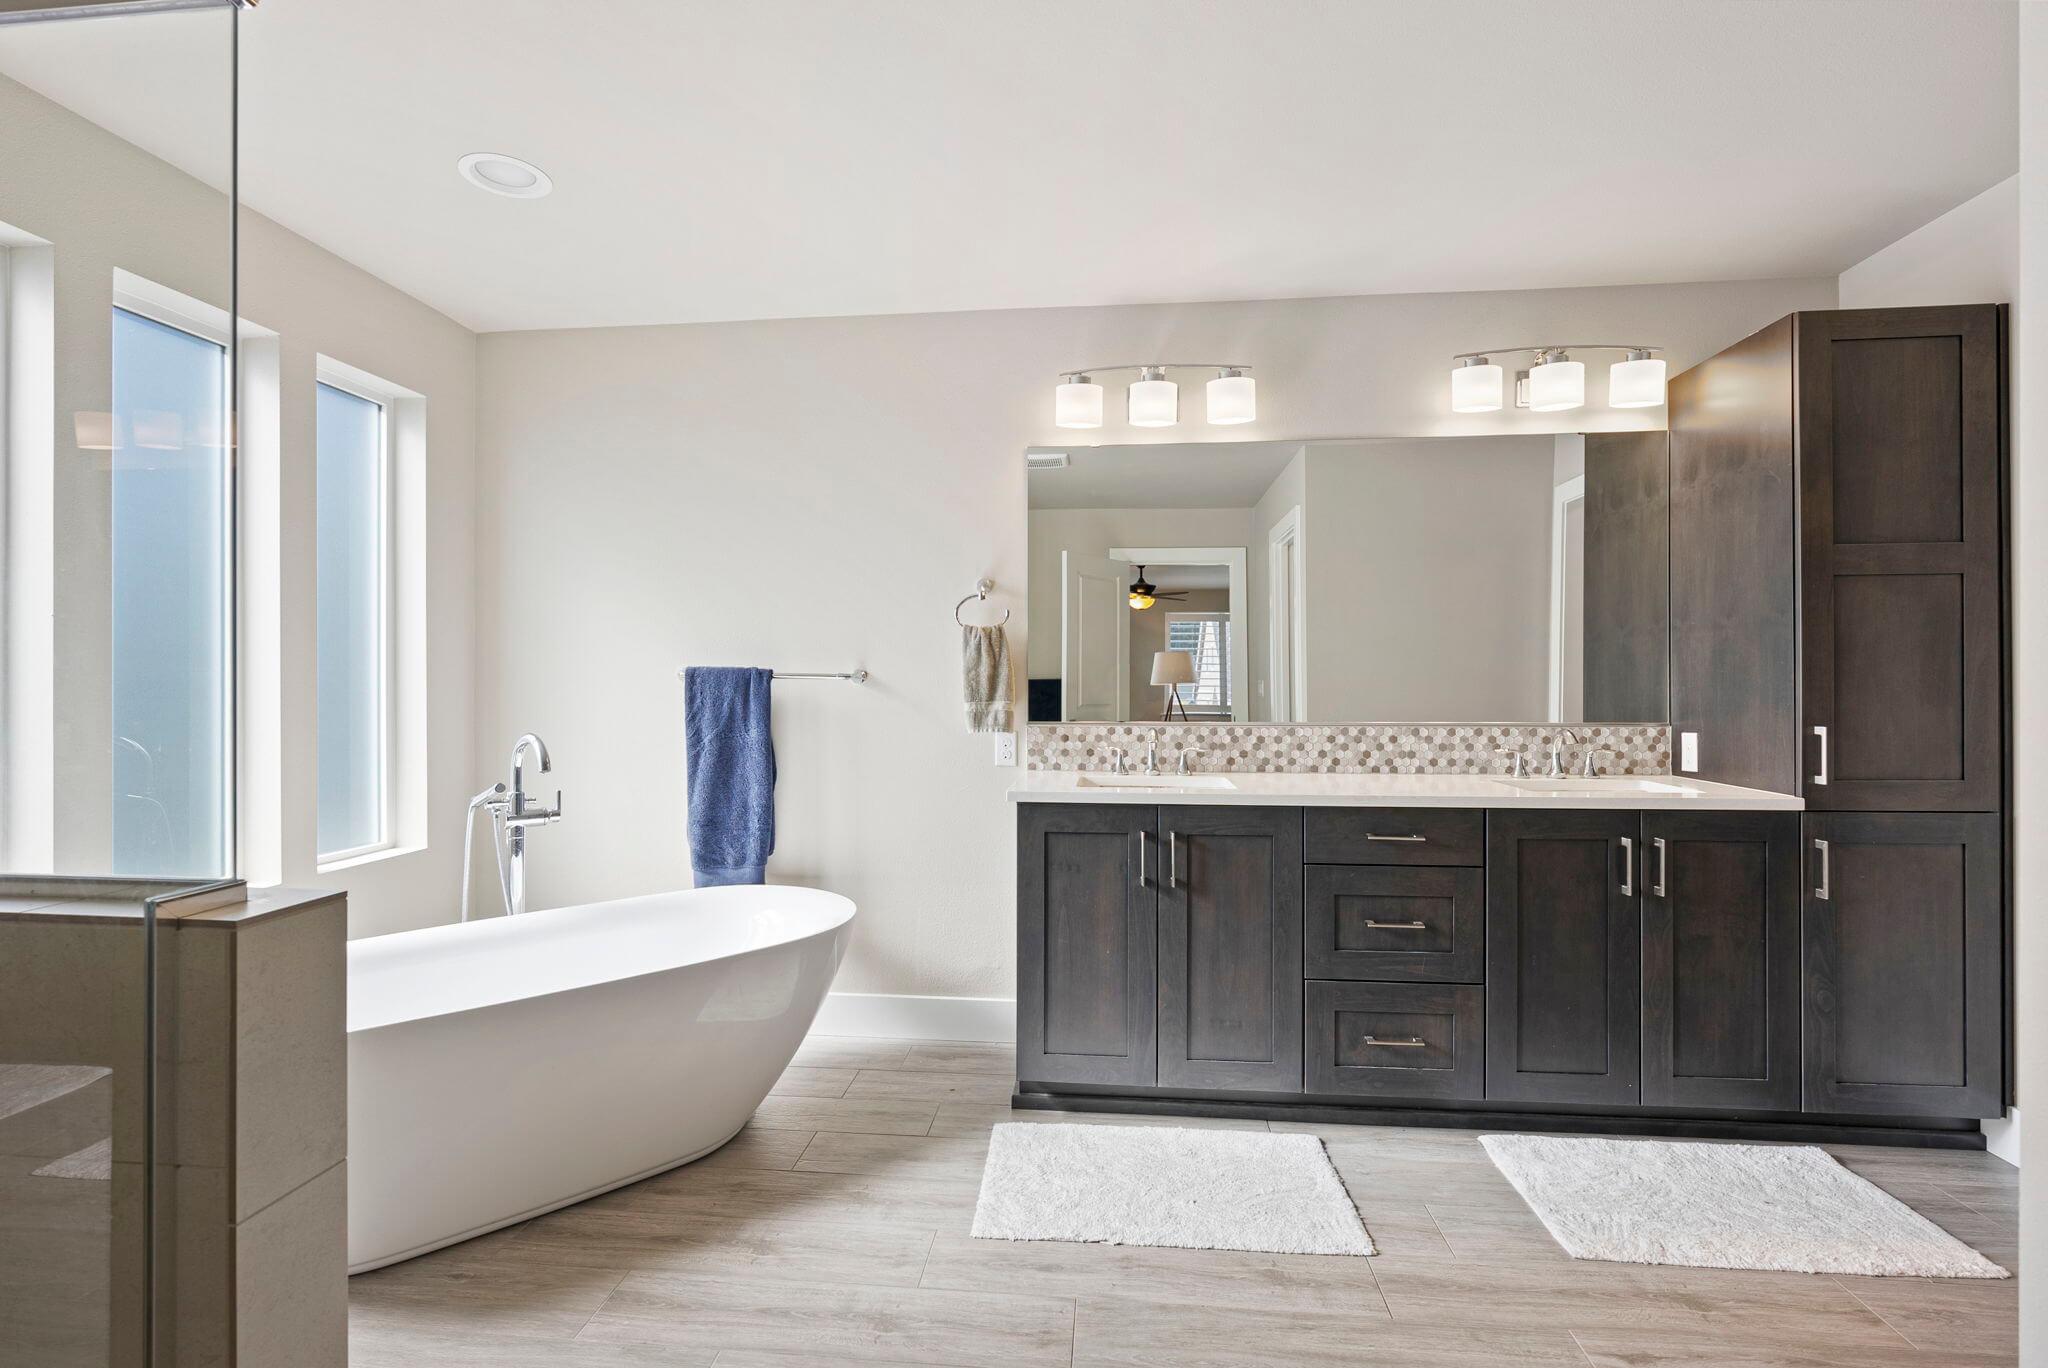 Luxurious primary bathroom with dual sink vanity